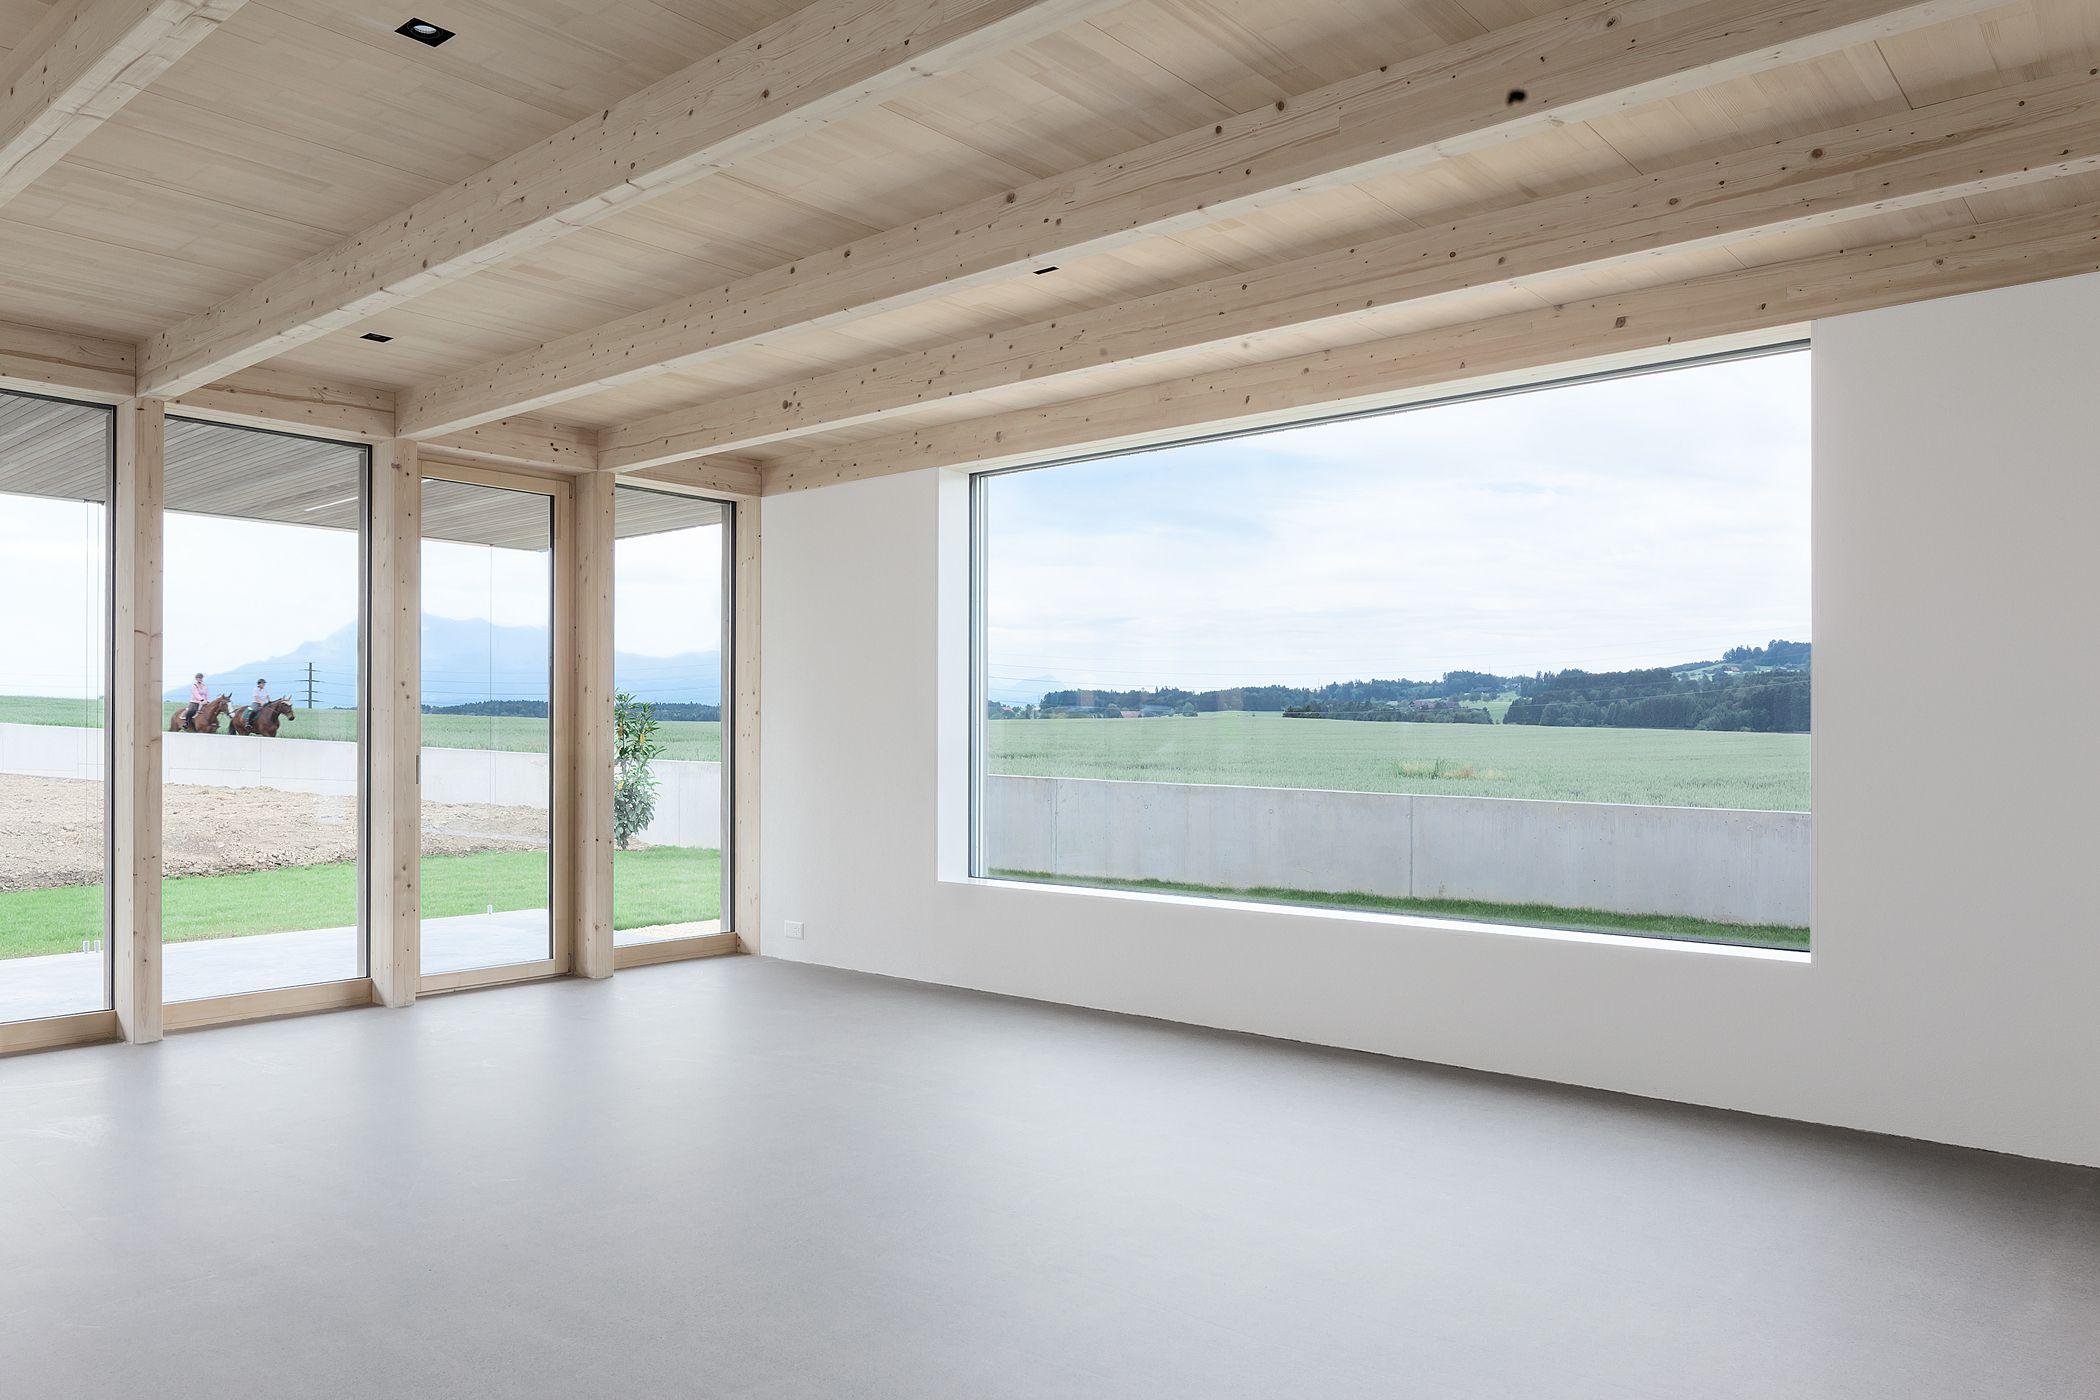 Einfamilienhaus Feldhöhe blgp architekten ag windows